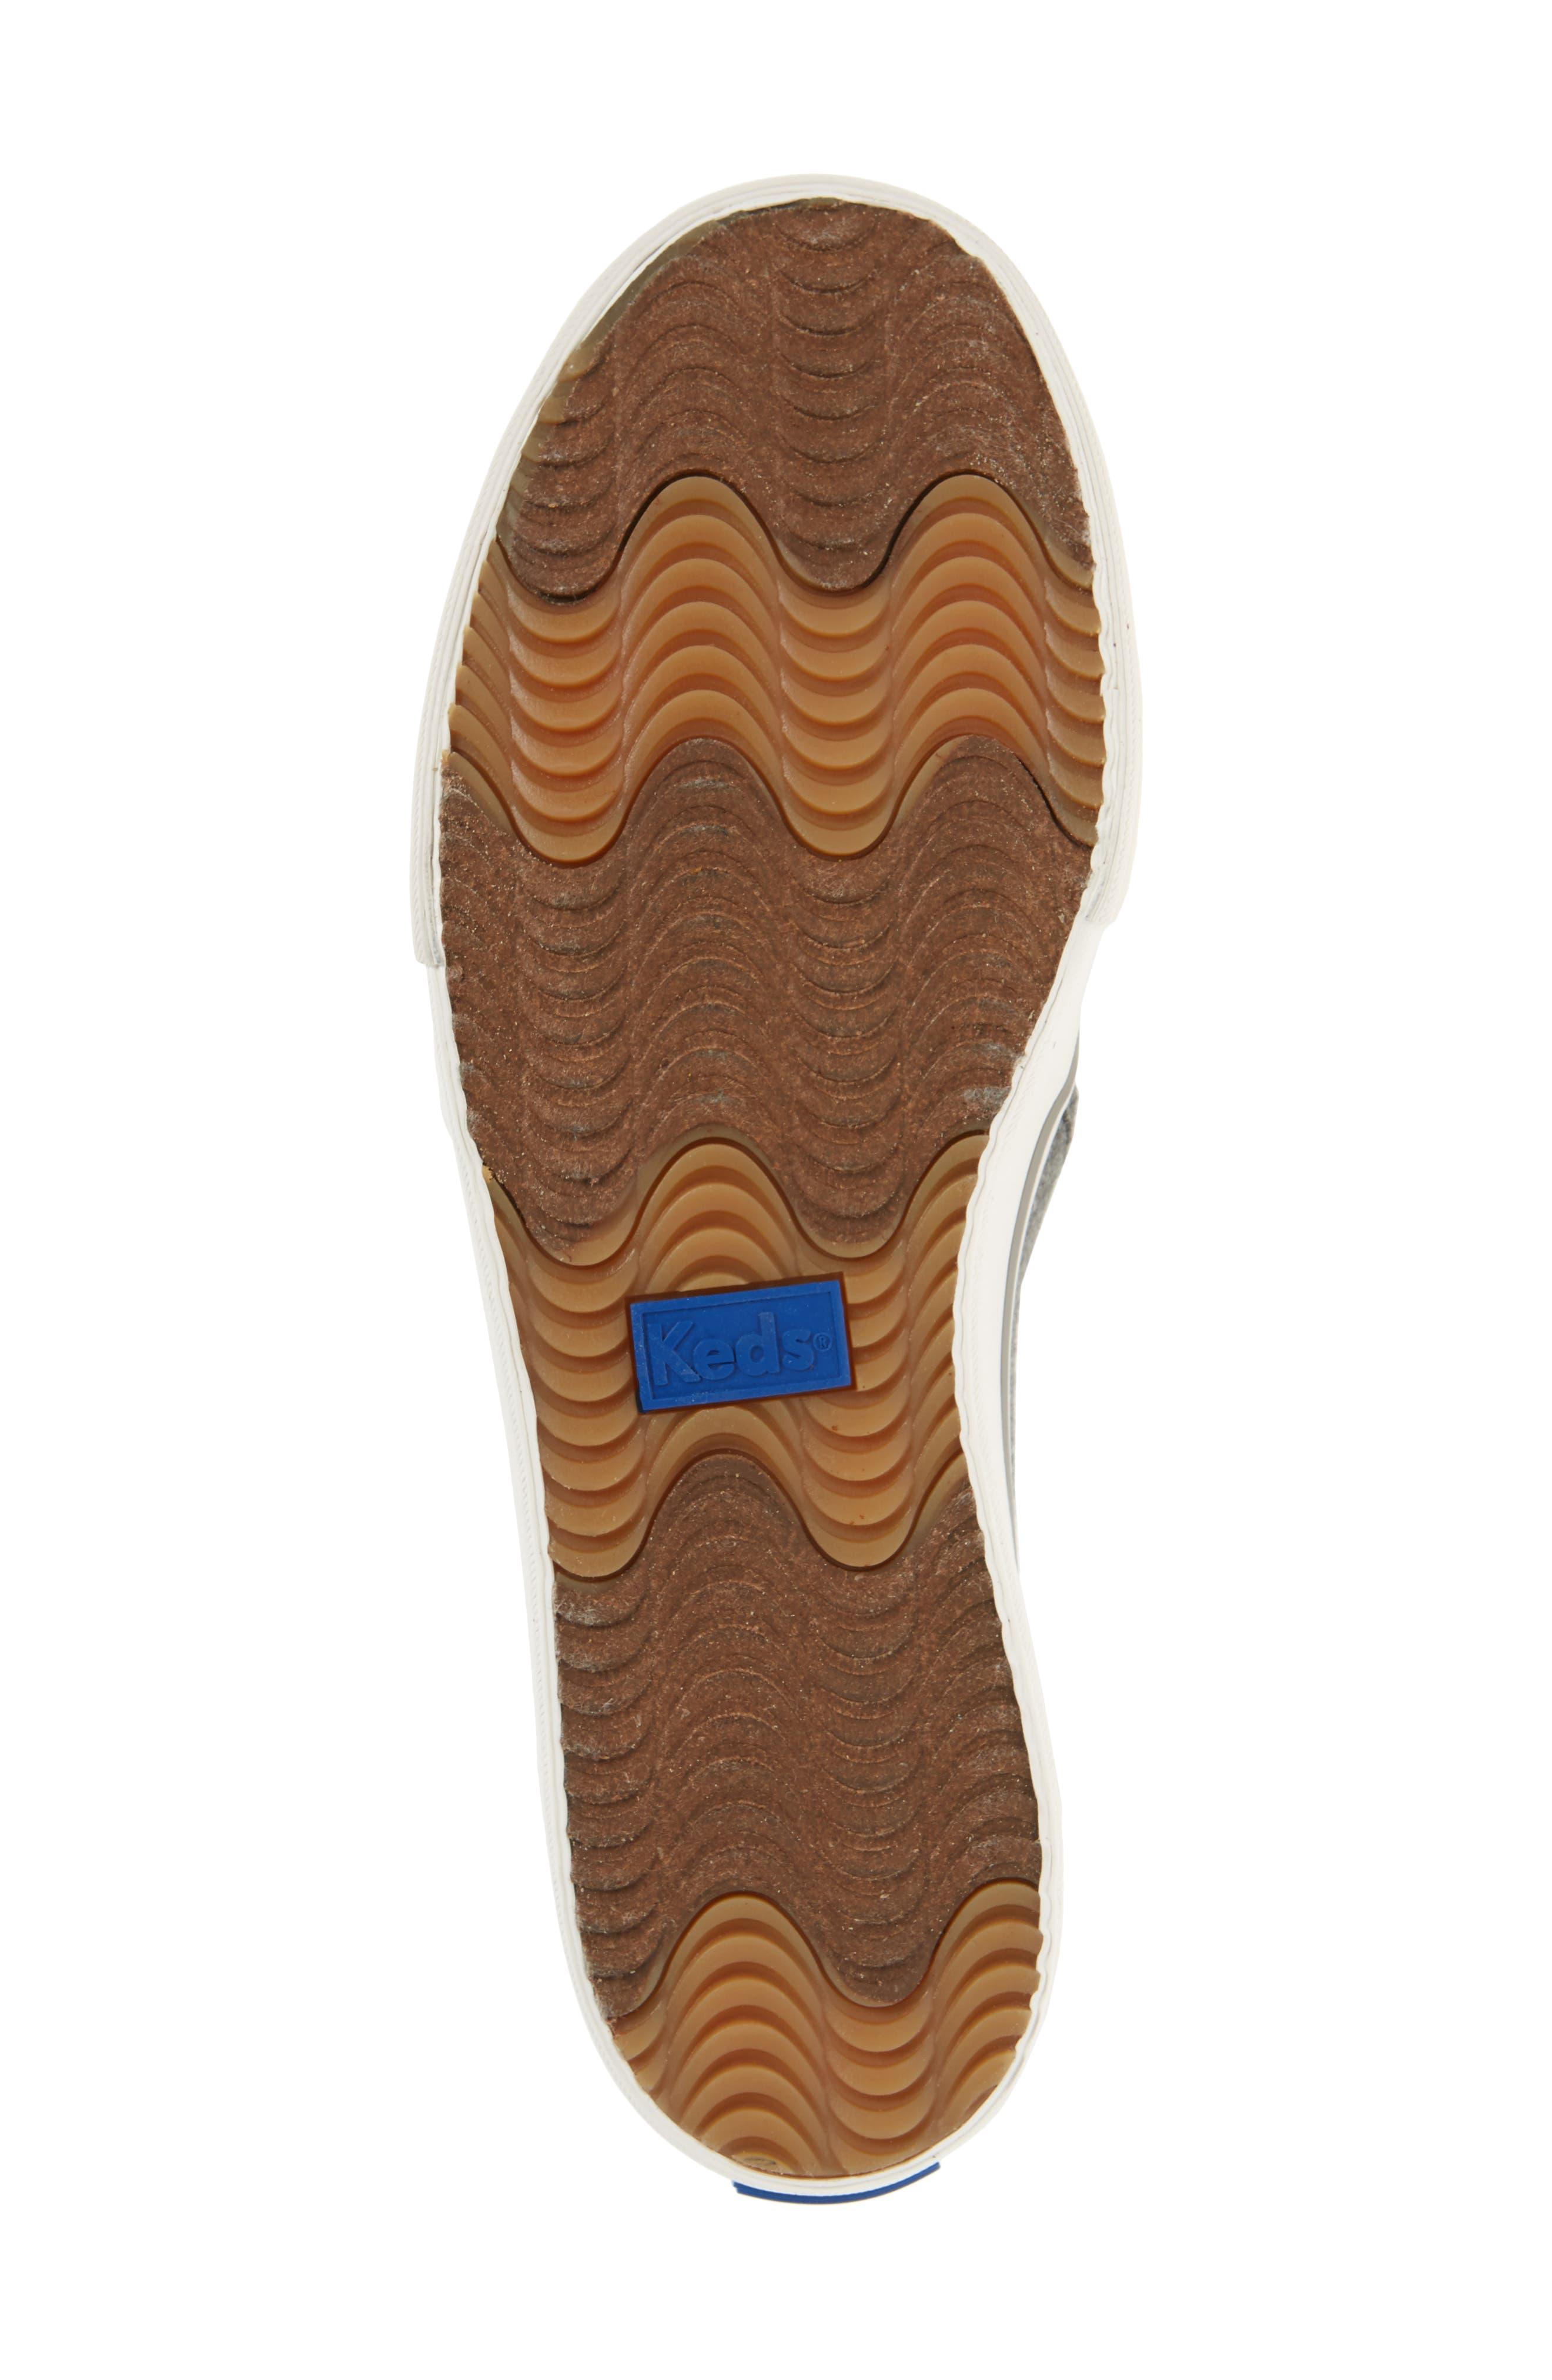 Double Decker Perforated Slip-On Sneaker,                             Alternate thumbnail 6, color,                             021